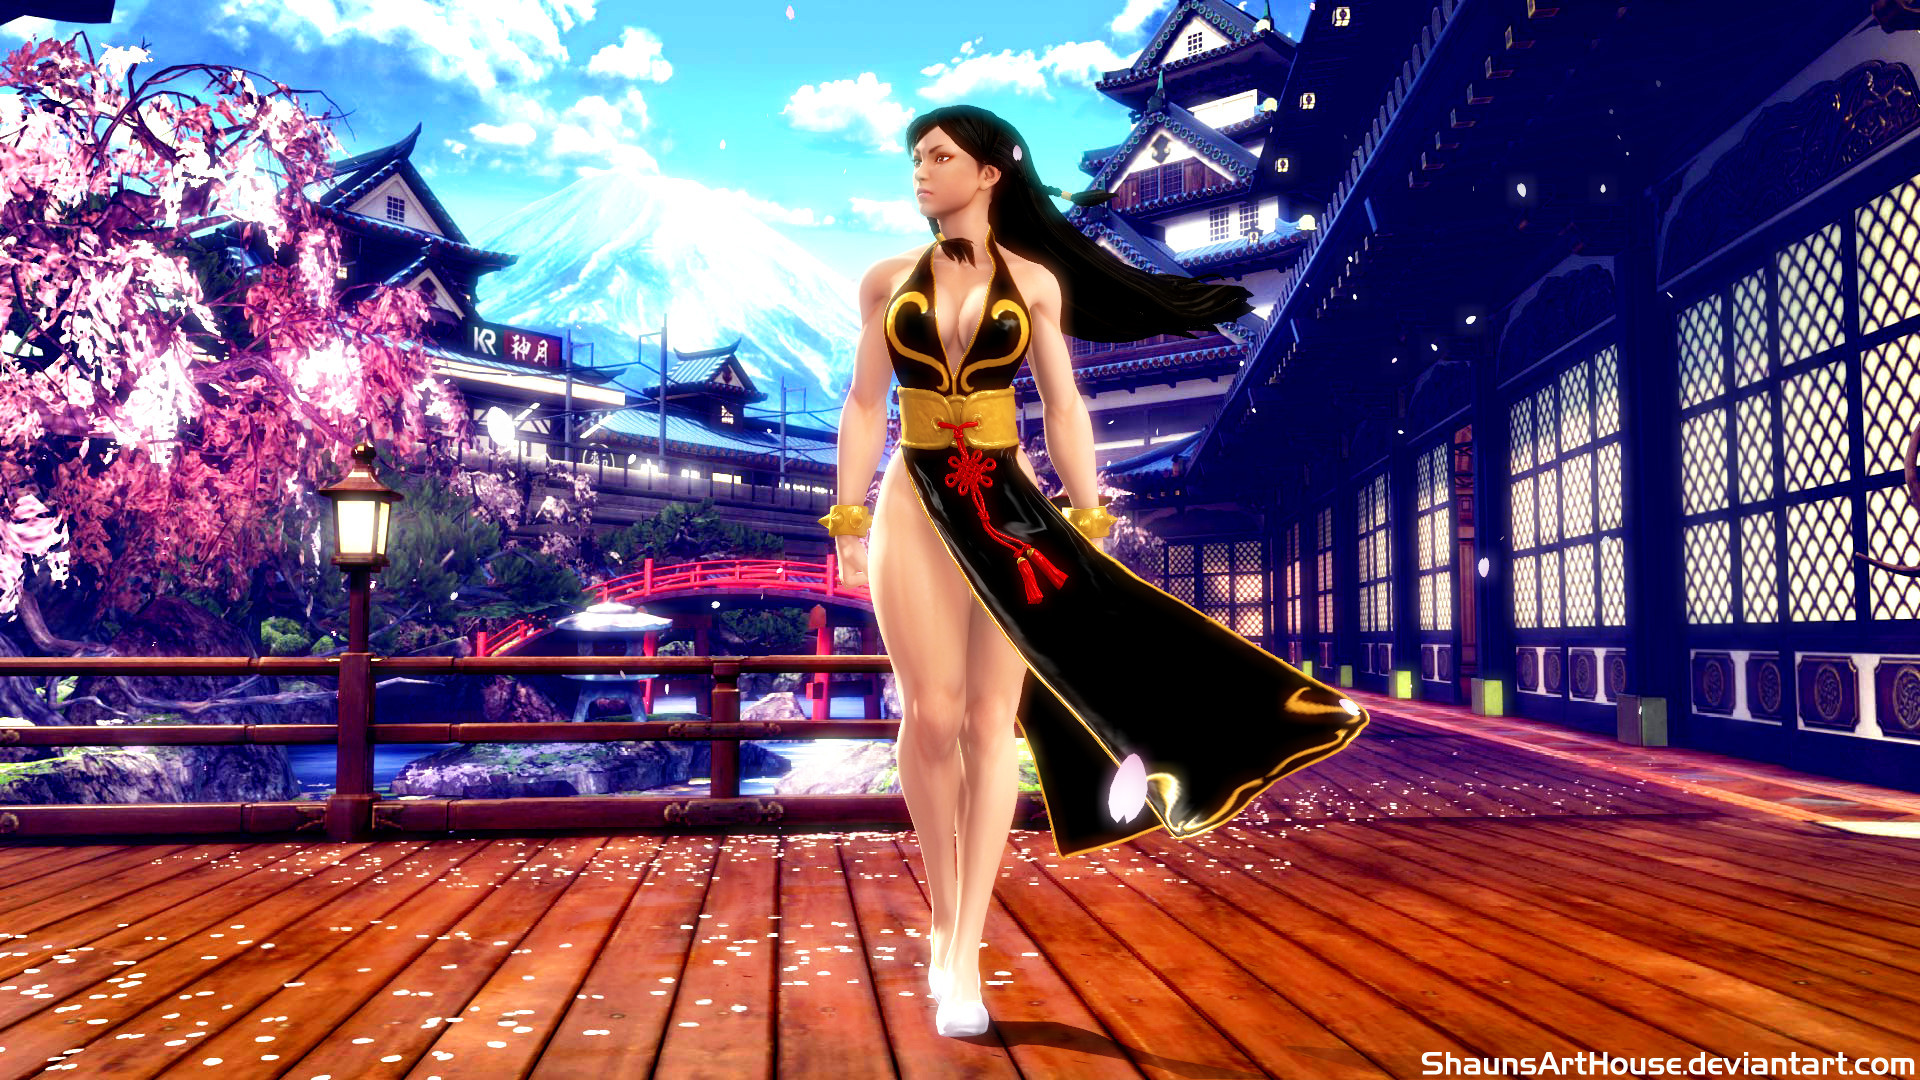 … Street Fighter Chun Li wallpaper by ShaunsArtHouse